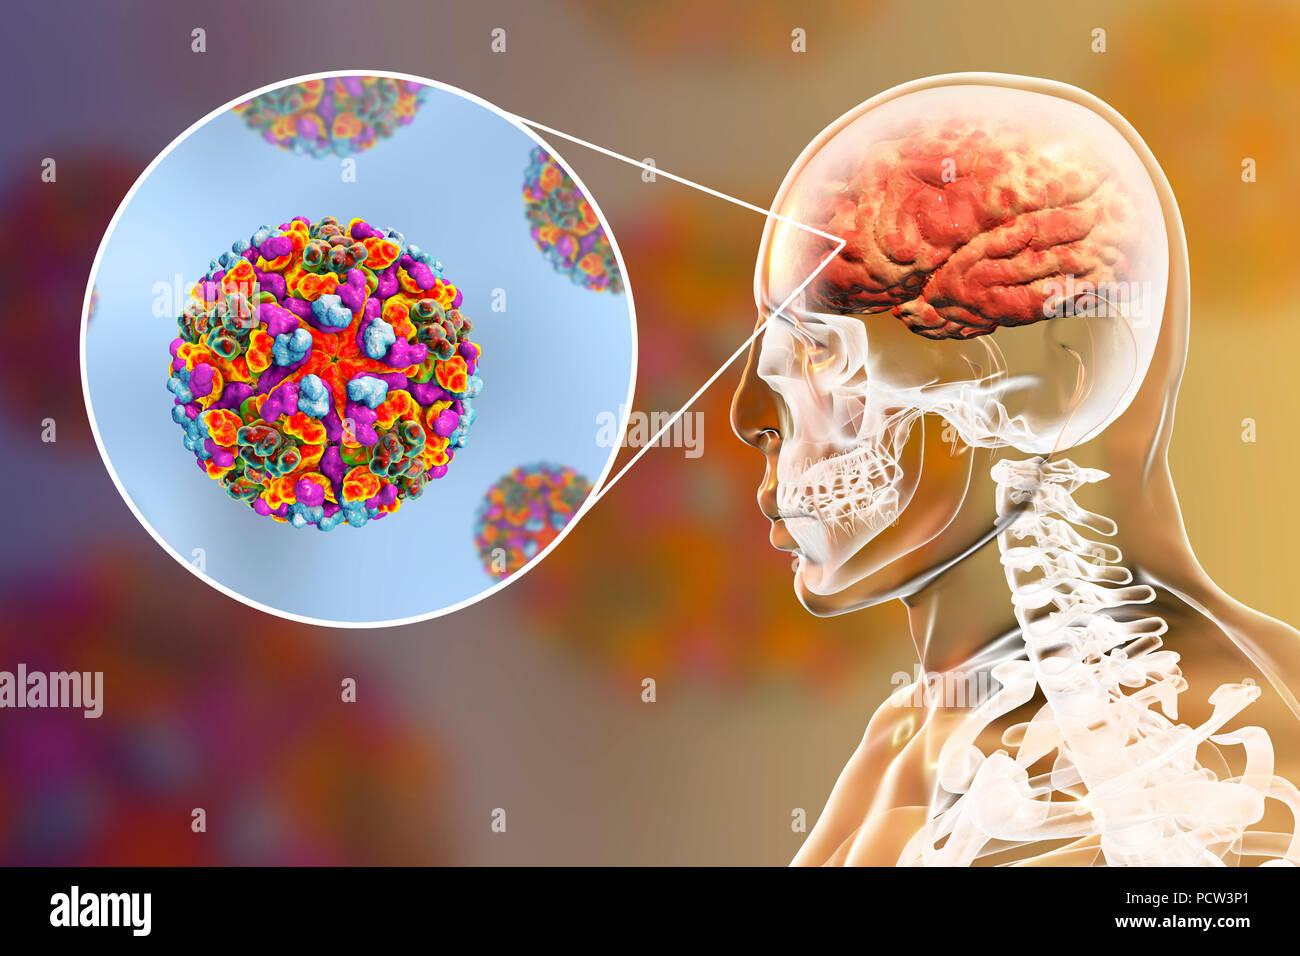 Western Equine Encephalitis Viruses Infecting Human Brain Computer